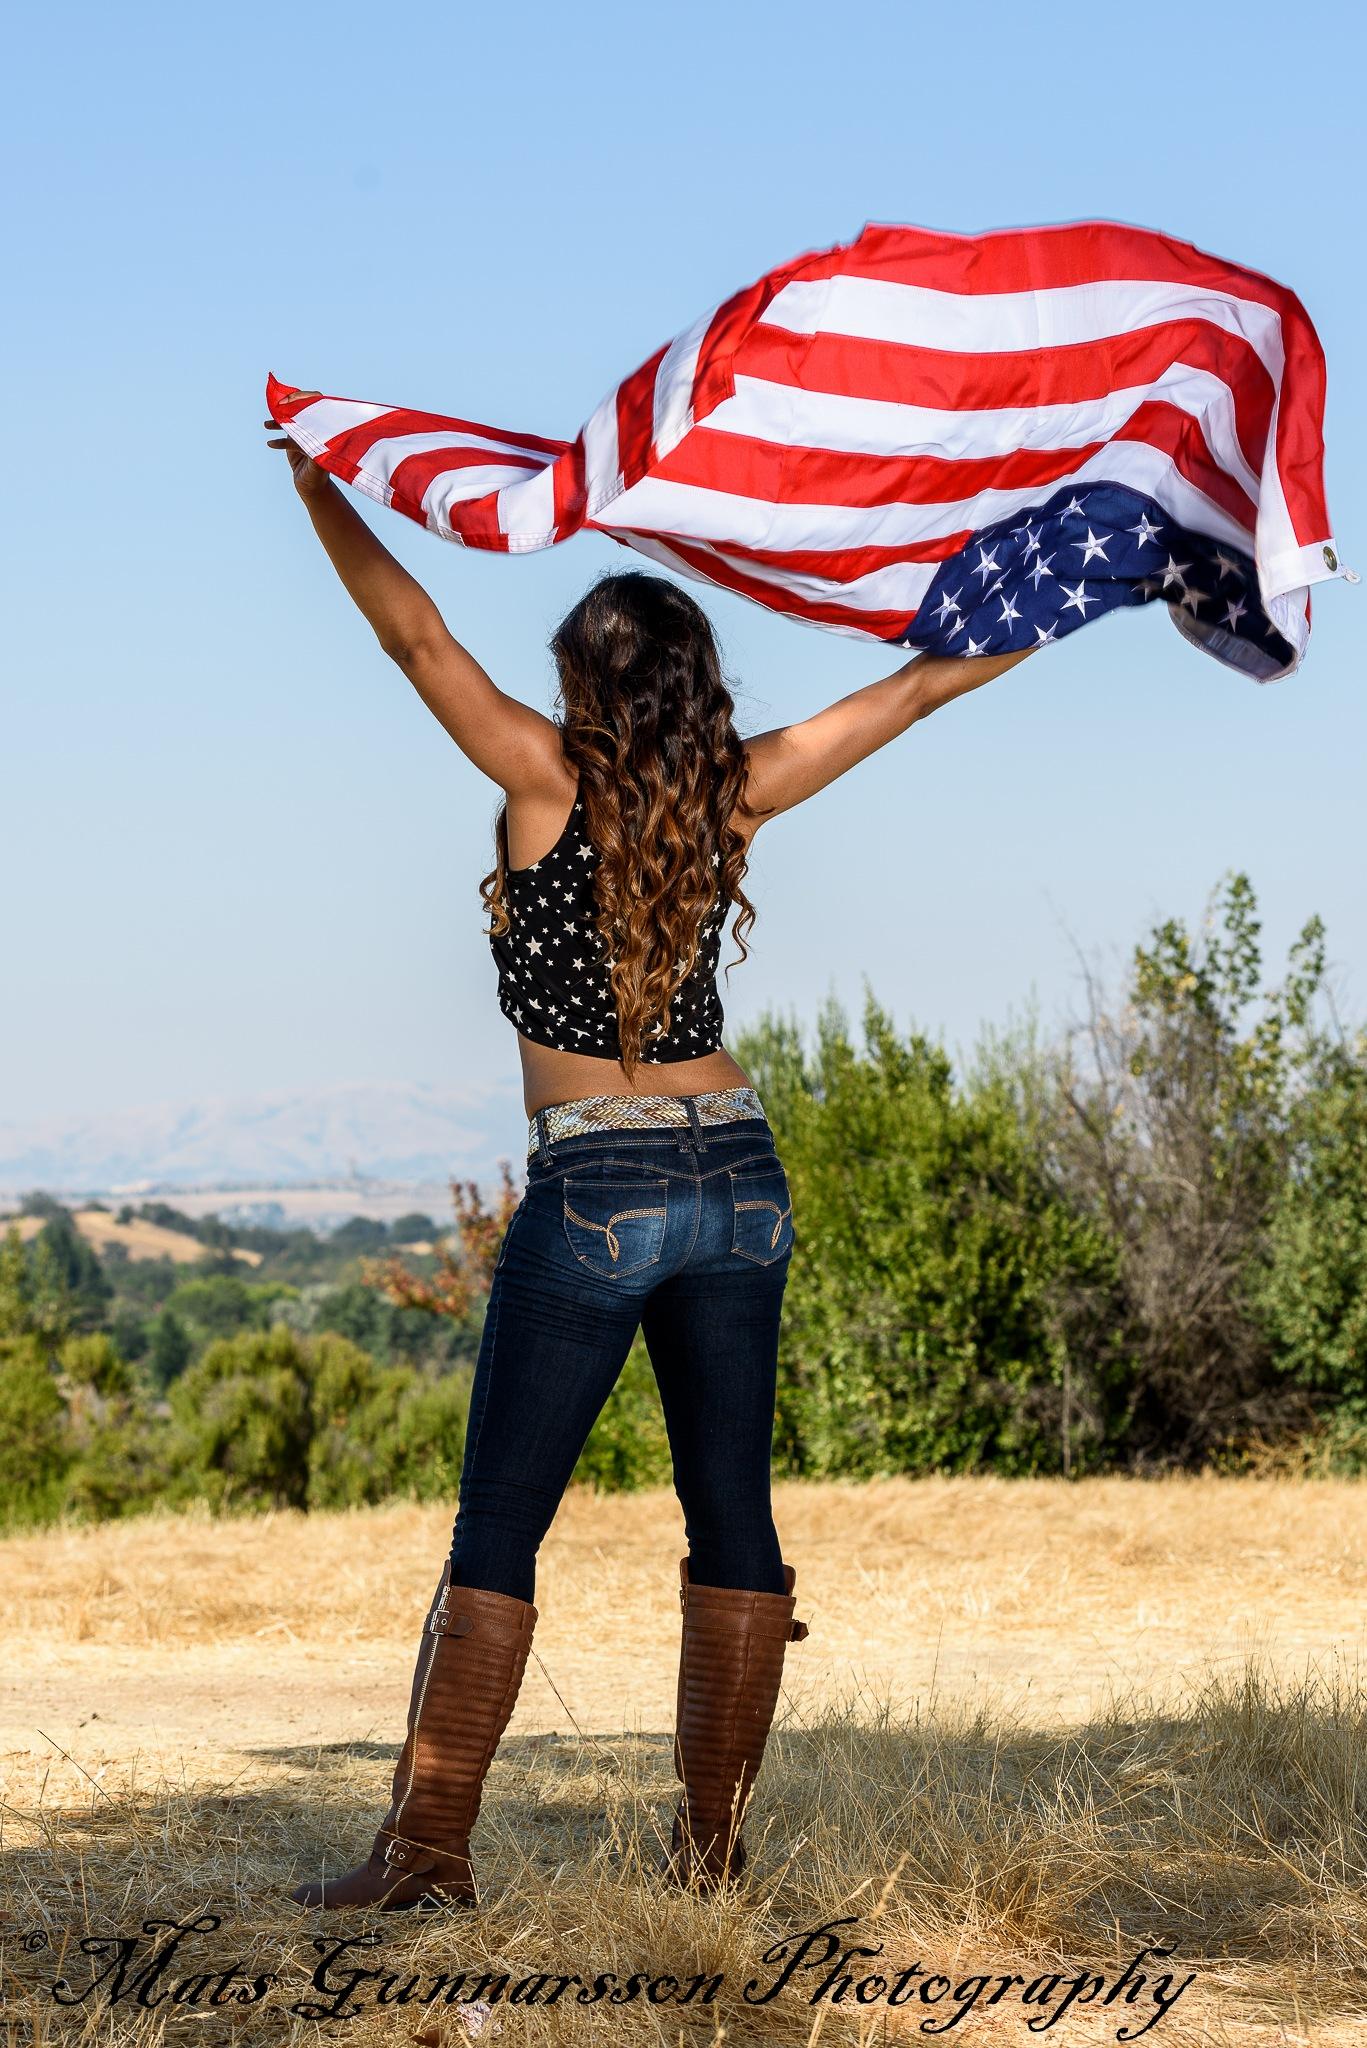 Proud American Flag bearer by MatsGunnarssonPhotography